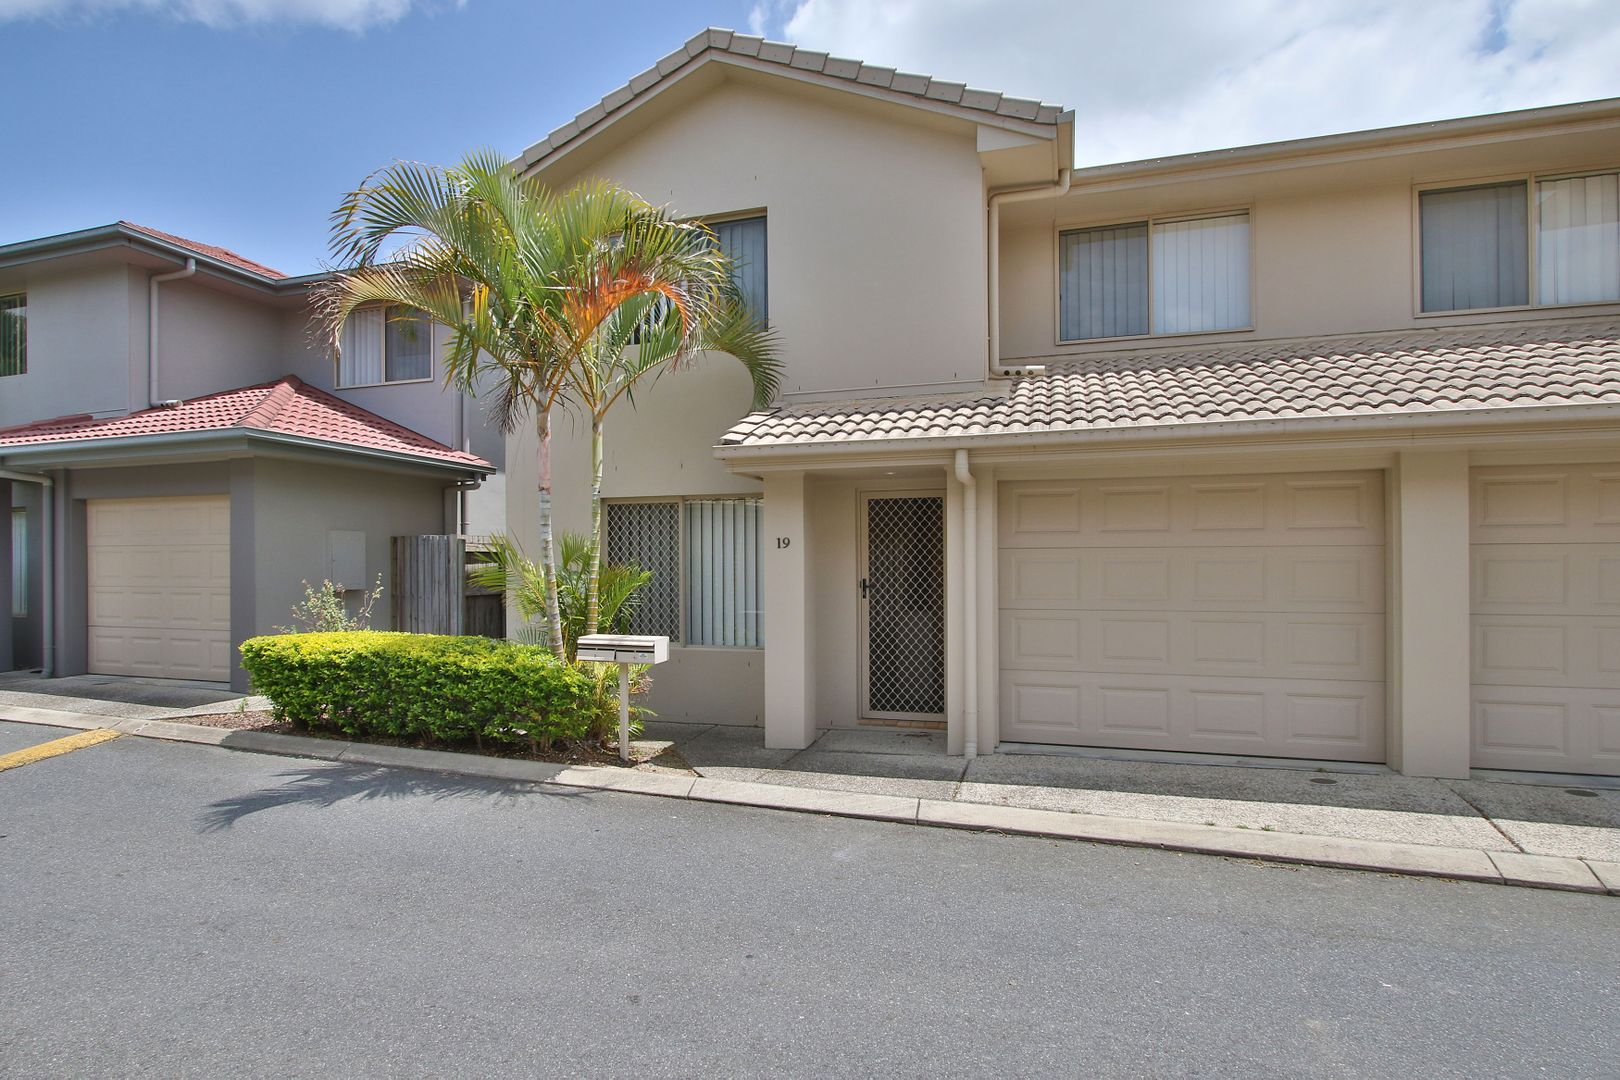 19/19 Kathleen Street, Richlands QLD 4077, Image 0